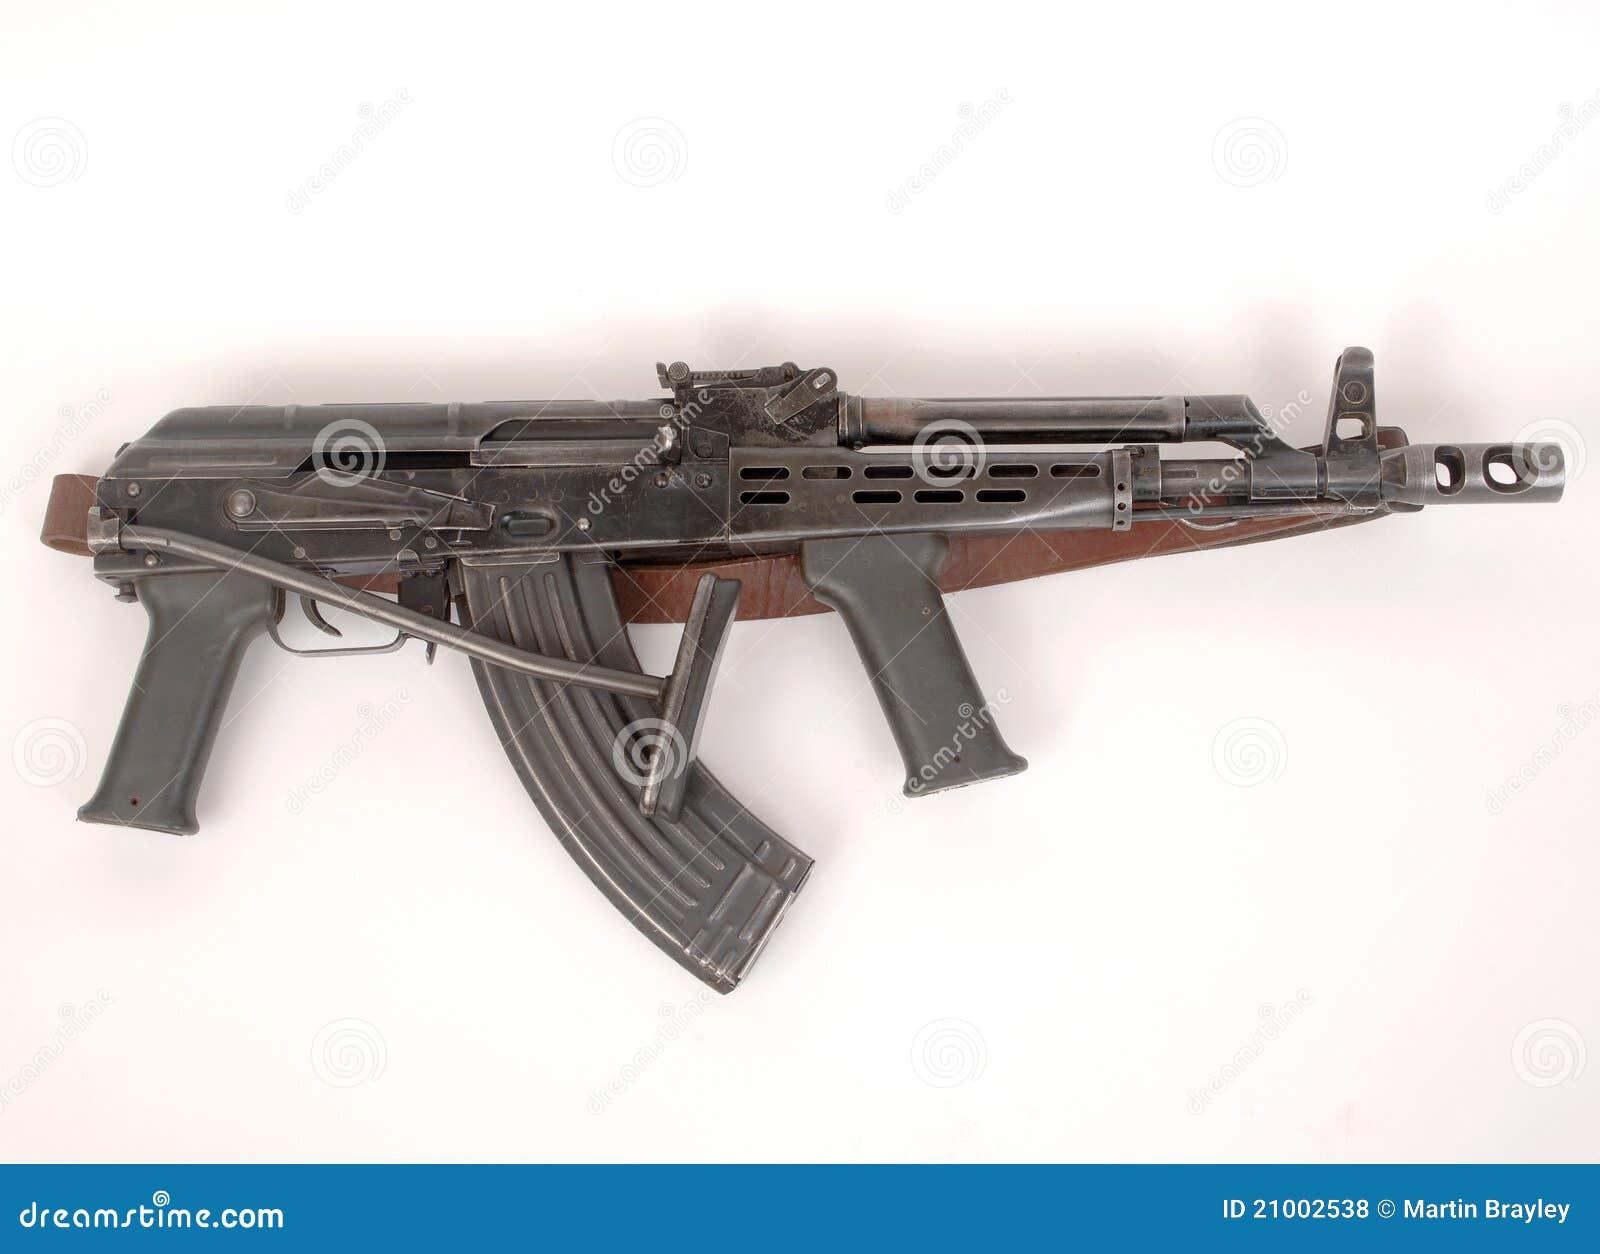 kalashnikov akm ak47 assault rifle royalty free stock kriss vector assault rifle assault rifle vector art